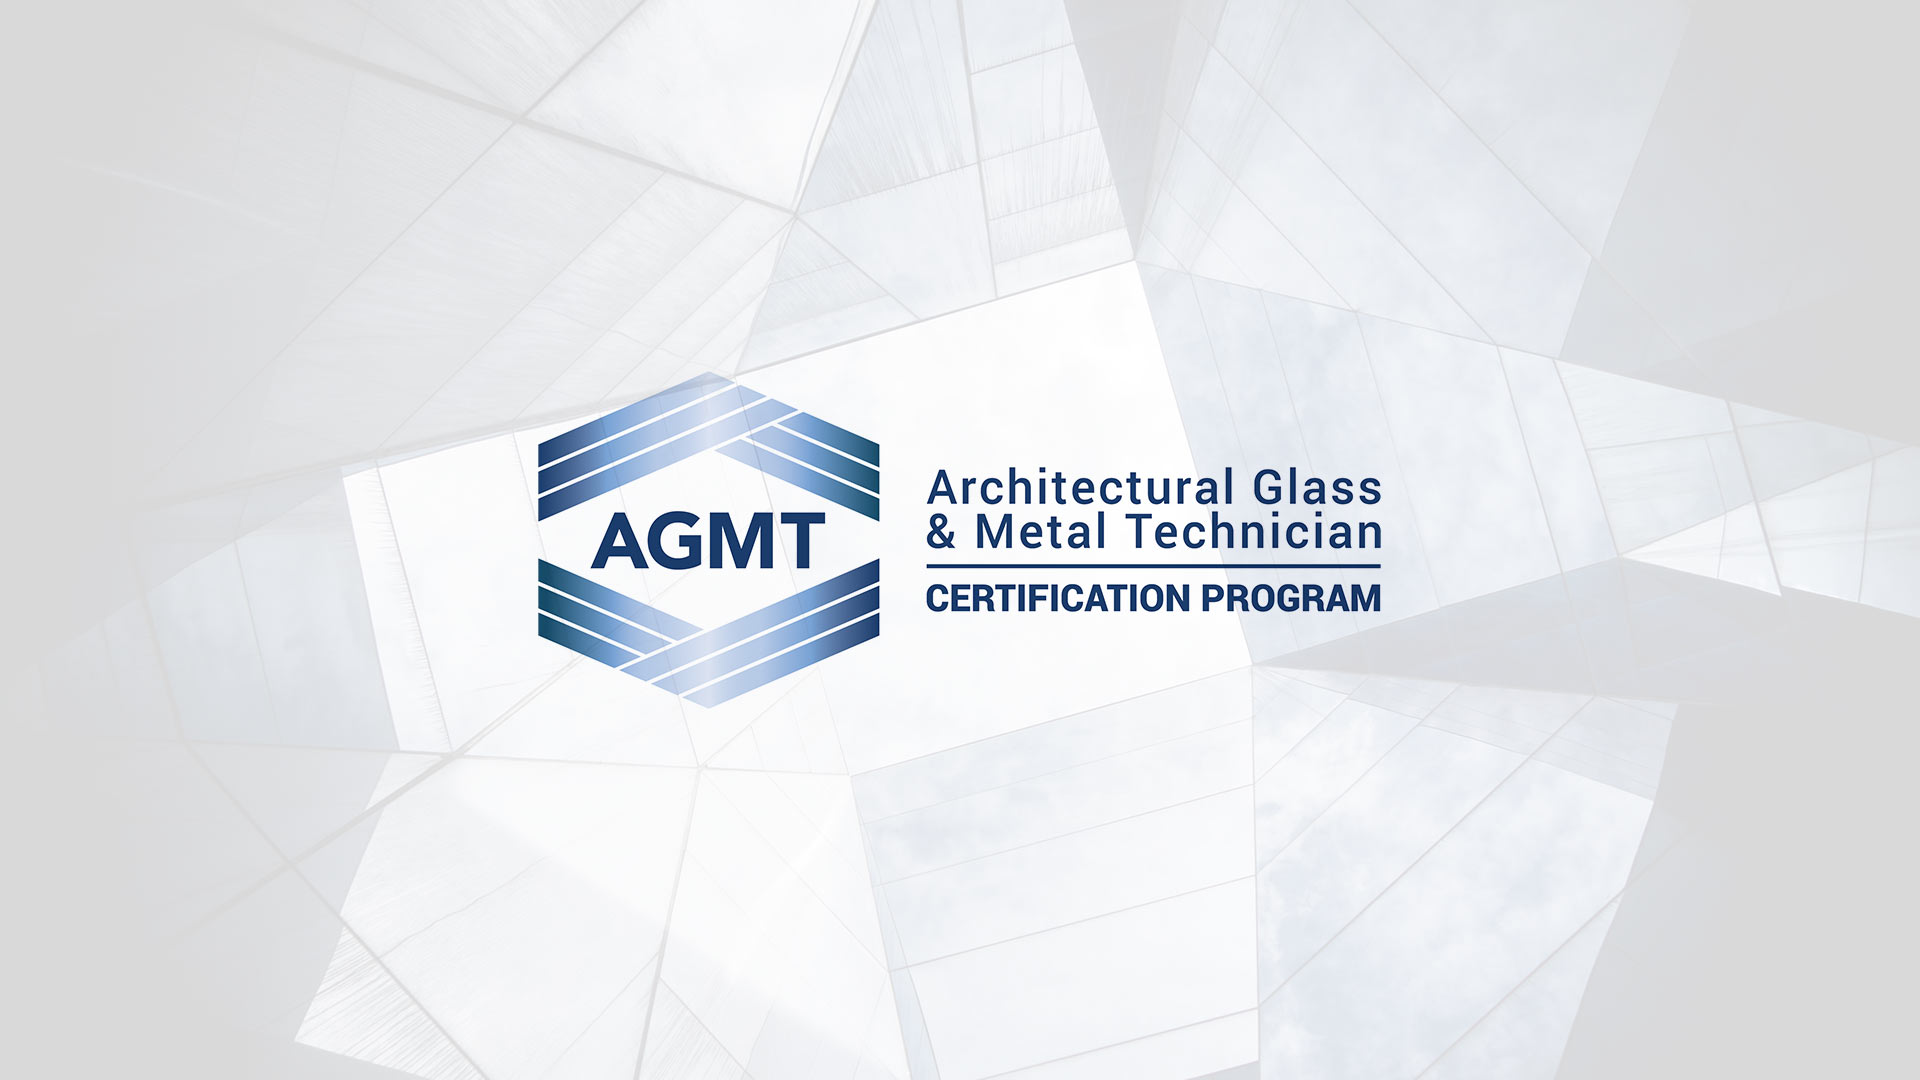 AGMT logo